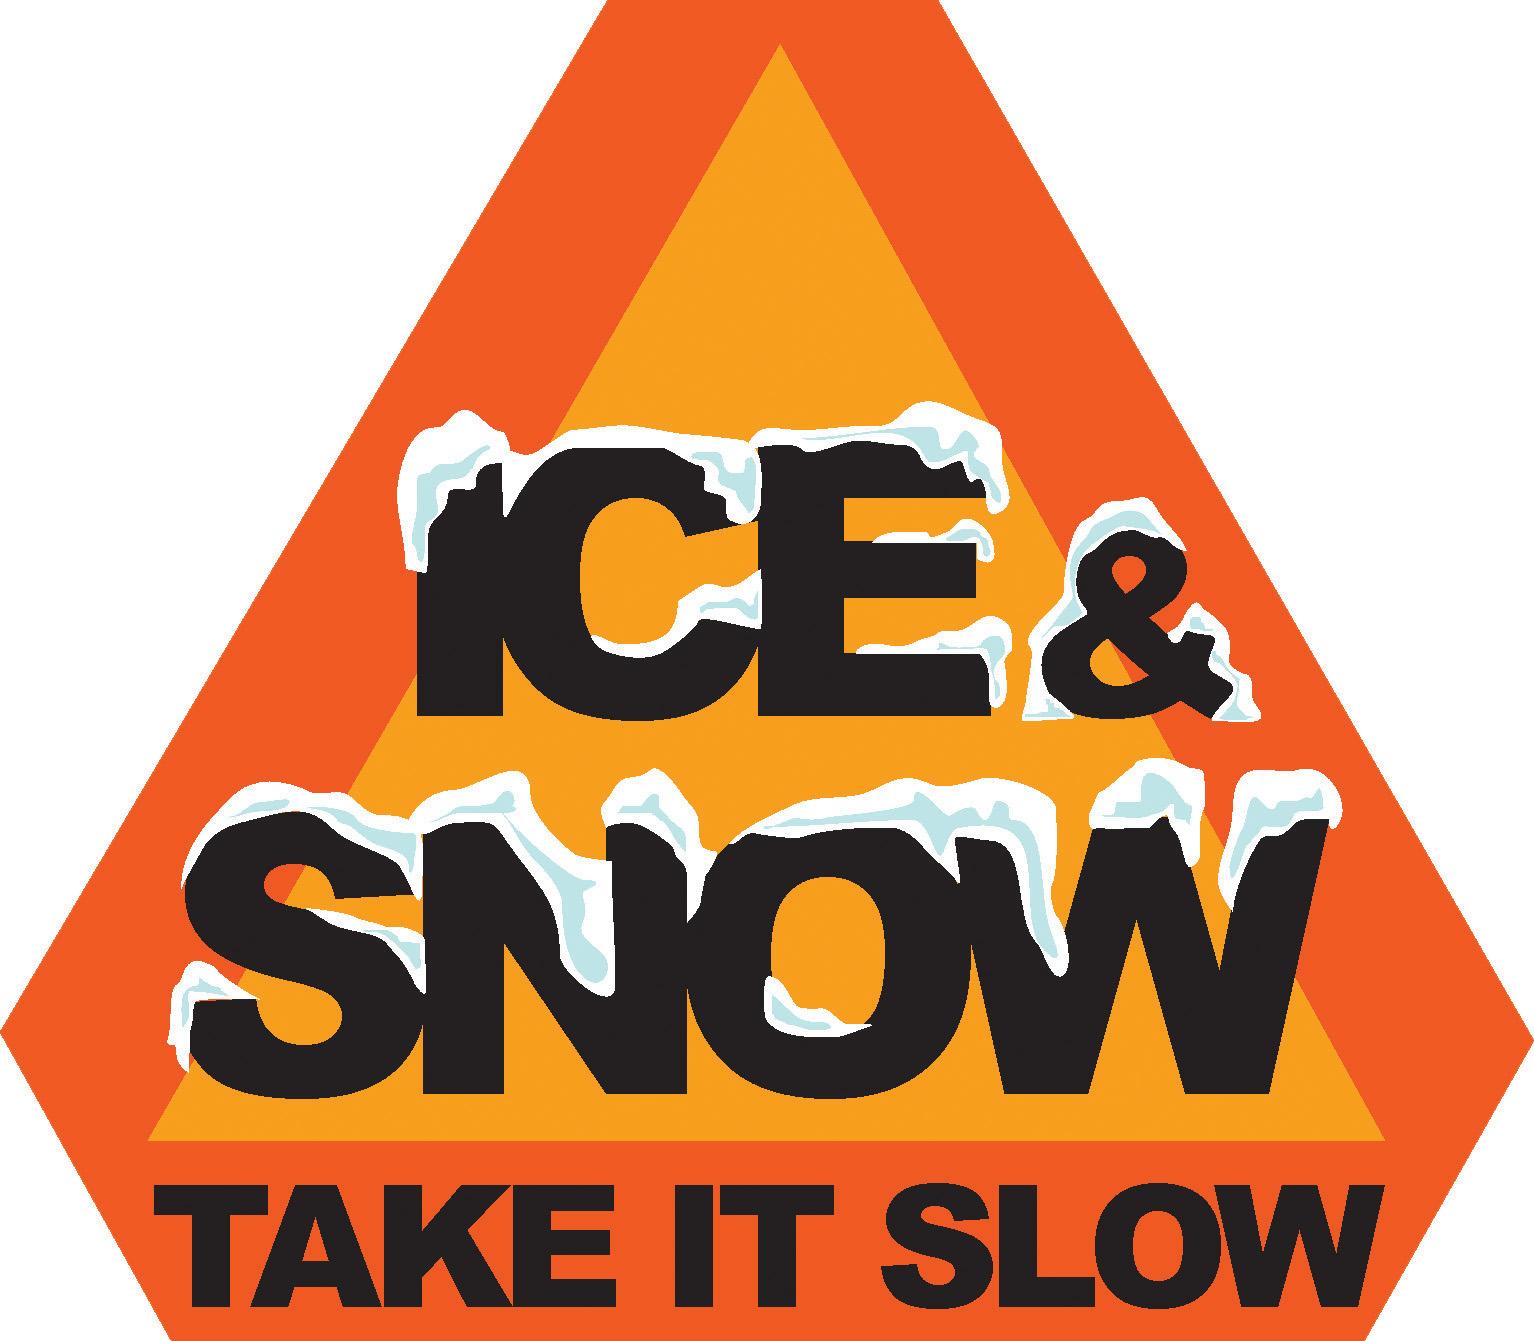 Safety Slogan Clipart.